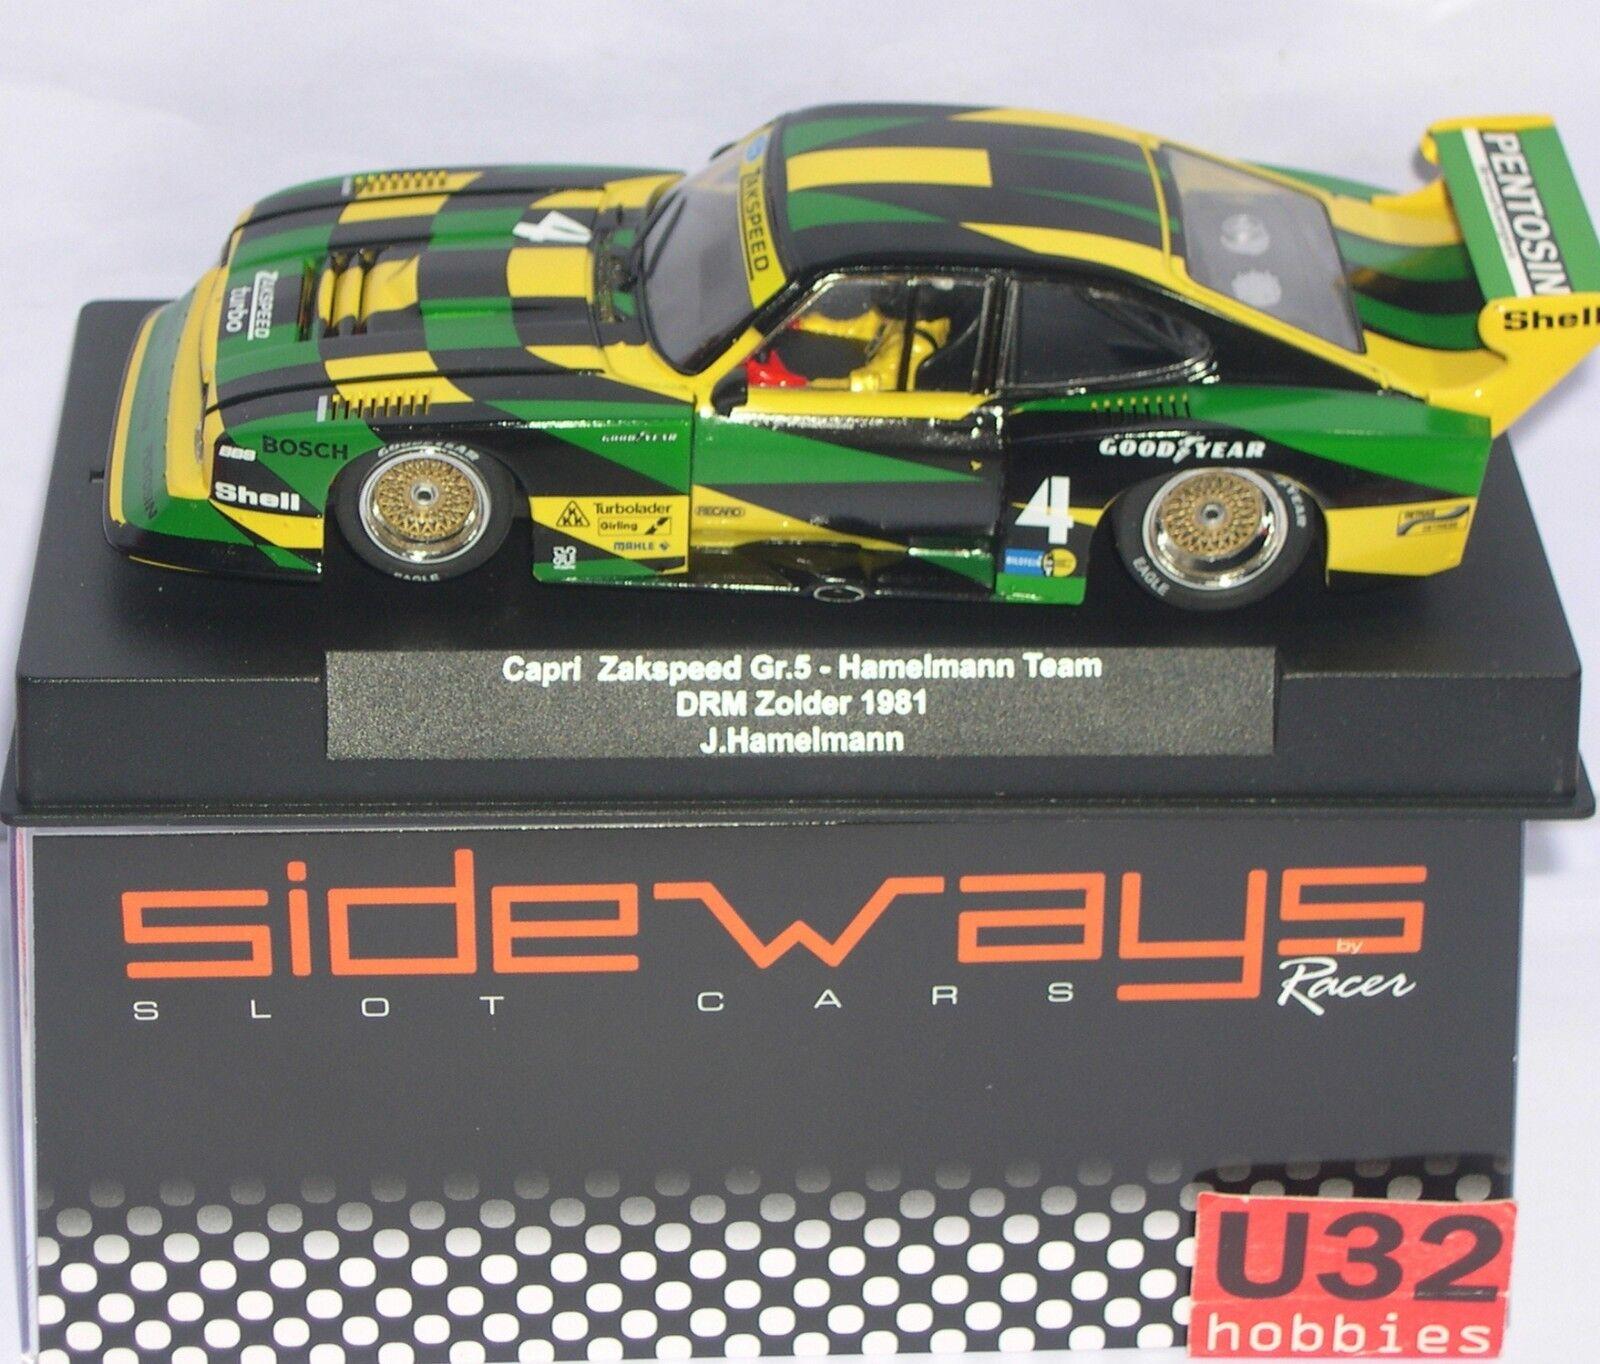 RACERS SIDEWAYS SW60 FORD CAPRI Gr.5 ZAKSPEED 4 DRM DRM DRM ZOLDER 1981 J.HAMELMANN cee8e1